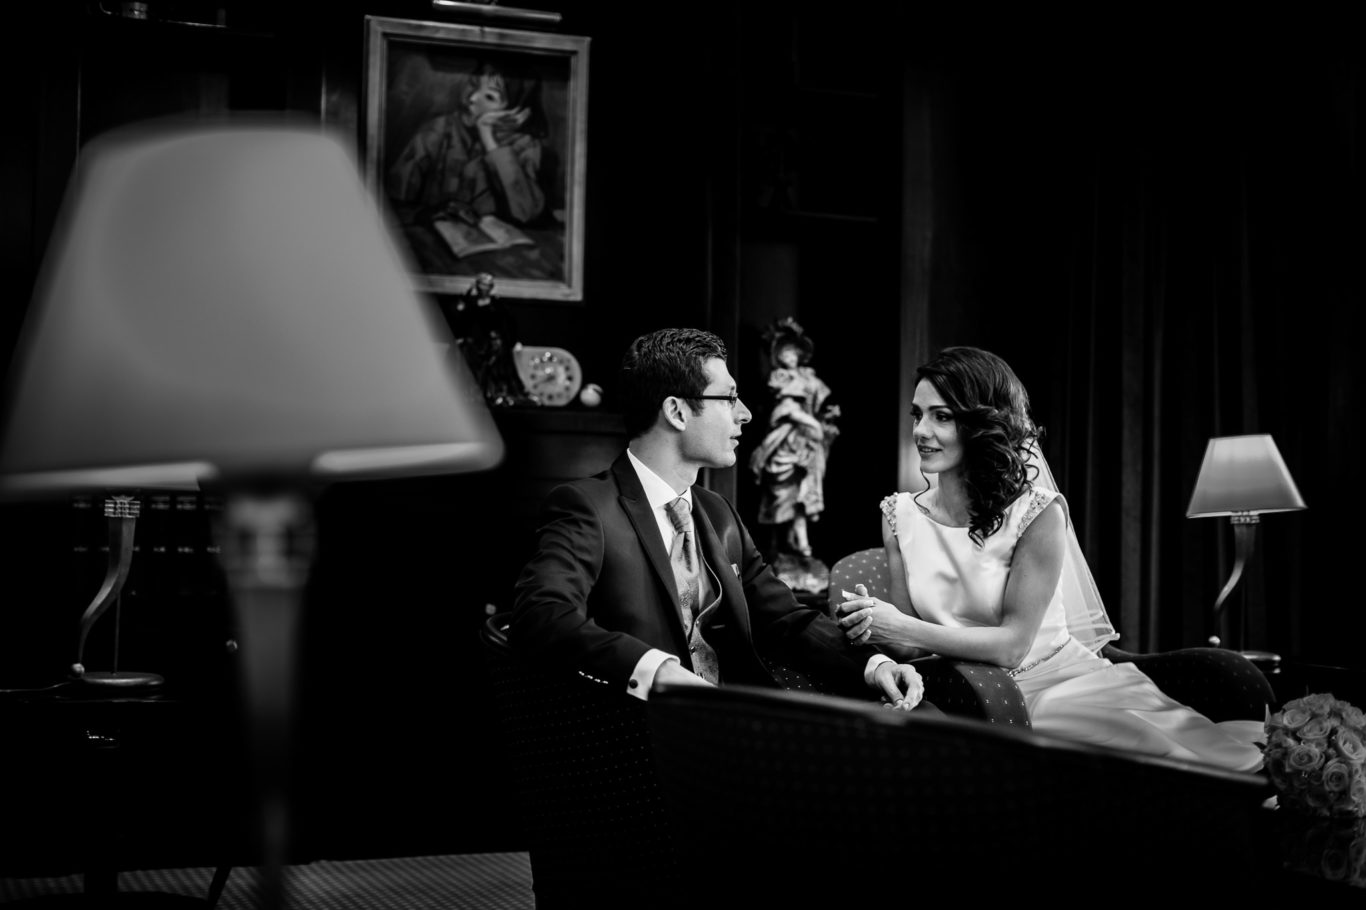 0298-fotografie-nunta-bucuresti-dana-radu-fotograf-ciprian-dumitrescu-cd2_6950